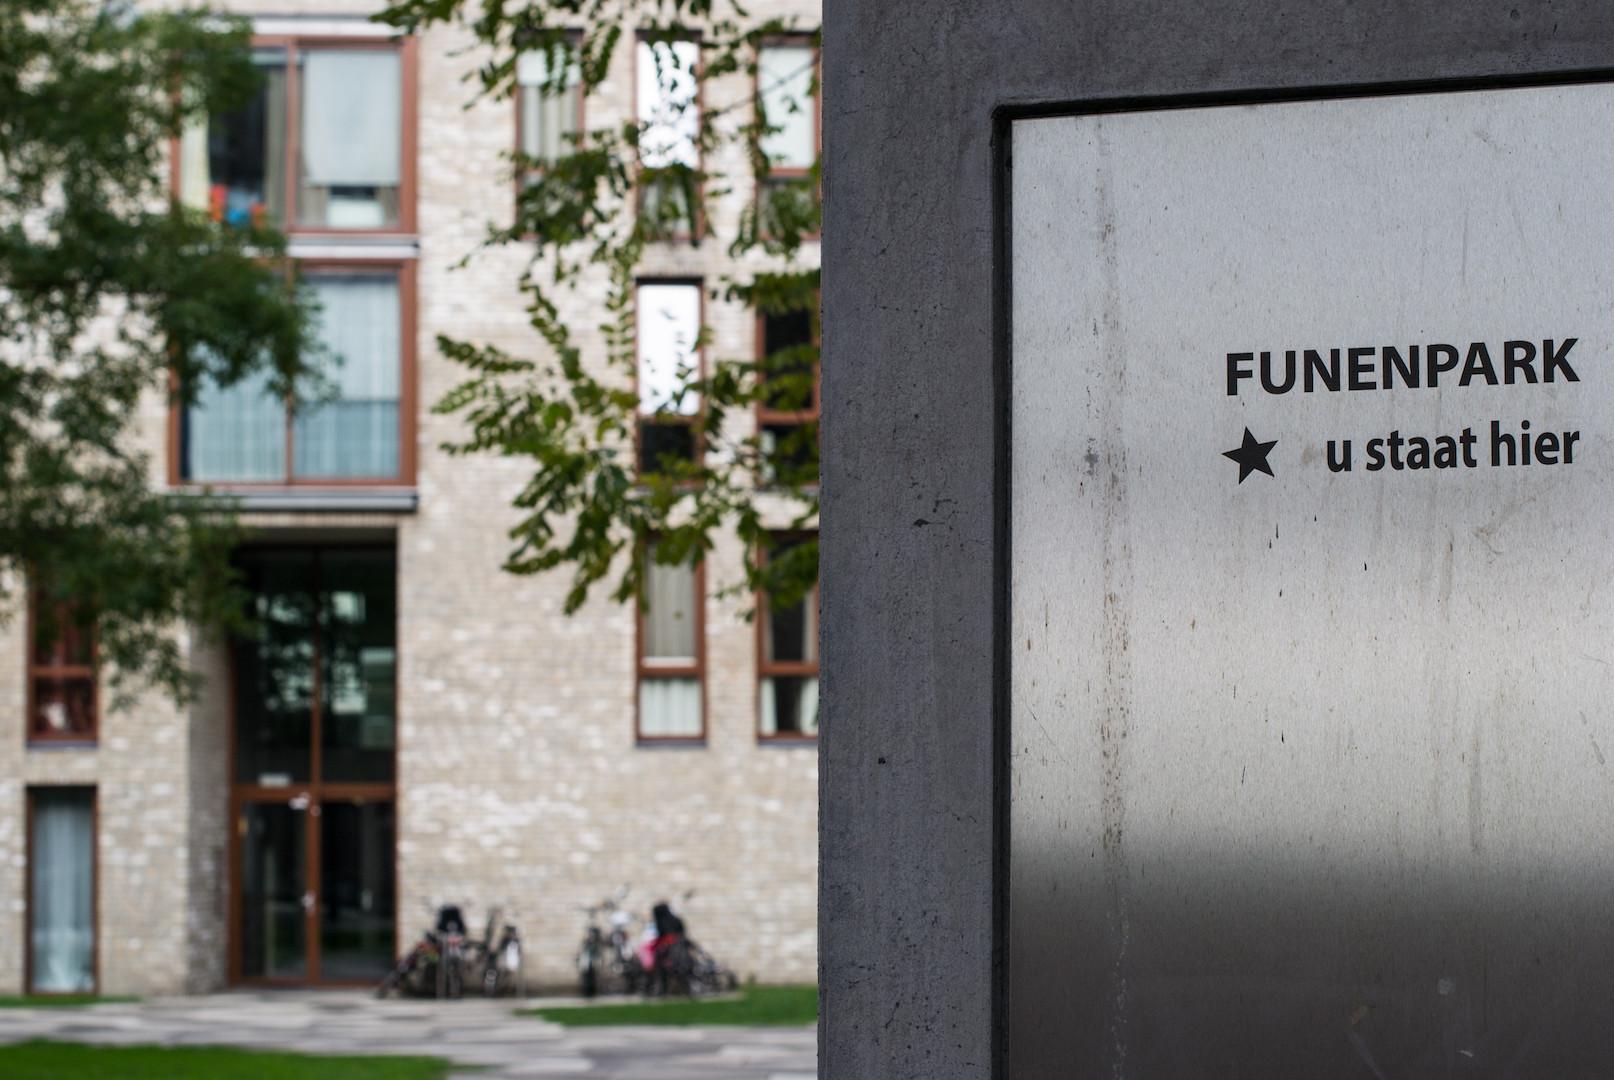 Funenpark